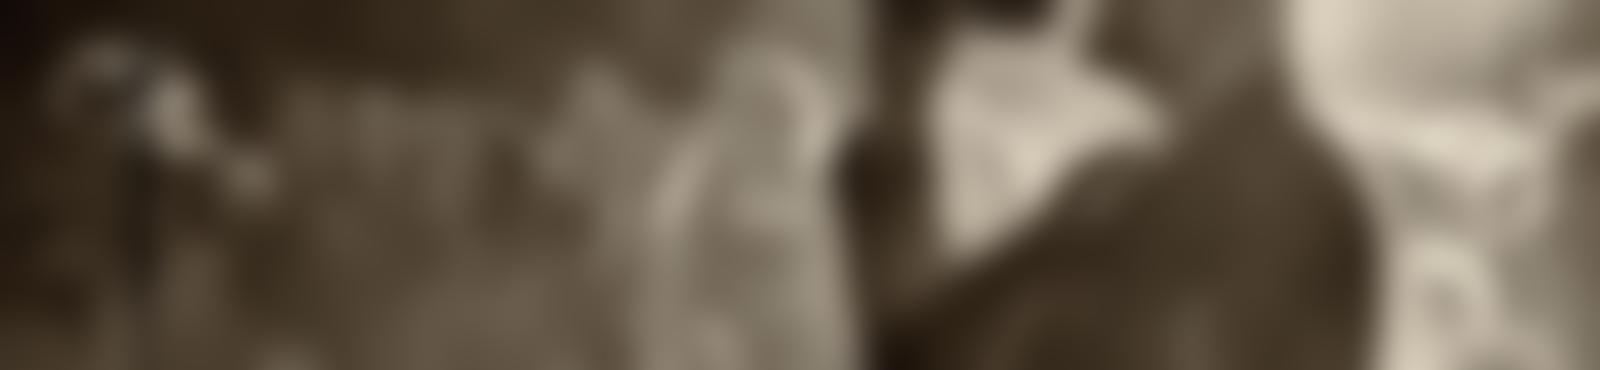 Blurred 7feae50f 0fb6 4f60 9465 20ead710643d